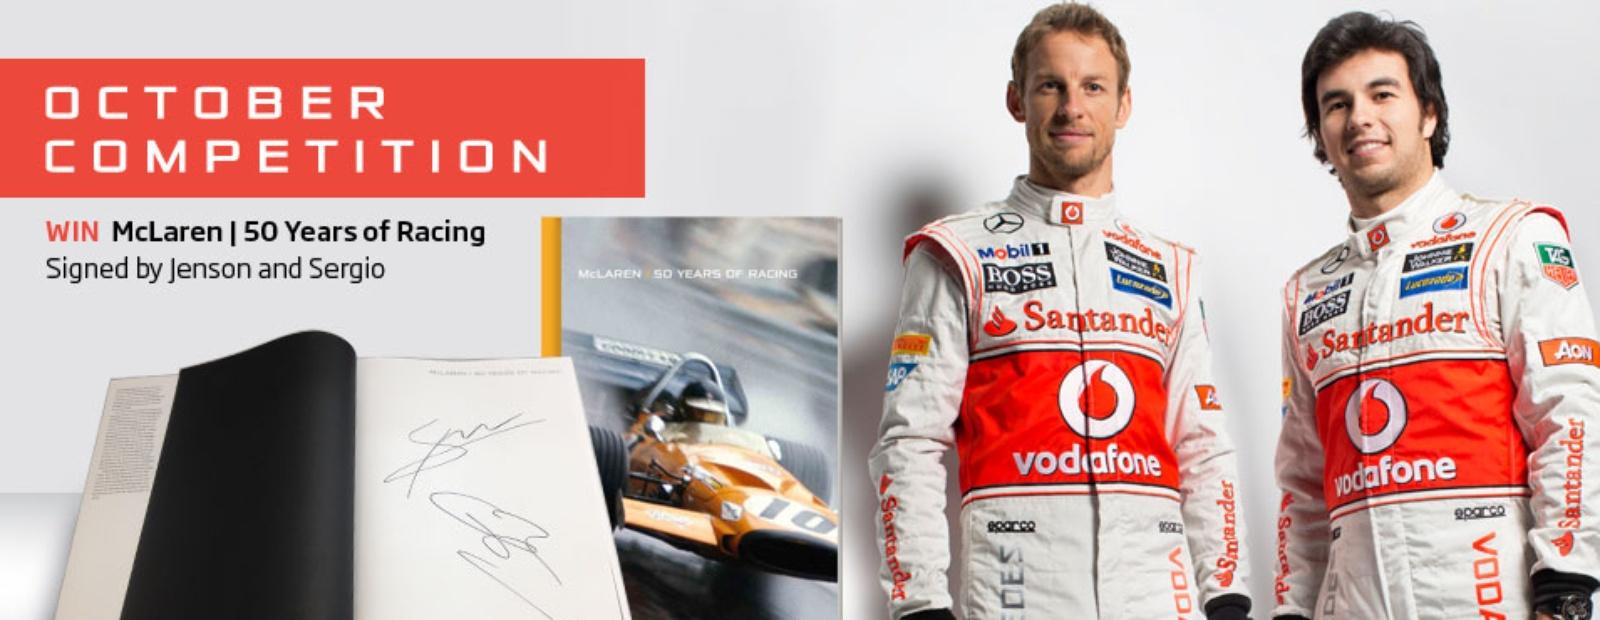 mclaren formula 1 - win a signed 50 years of racing book